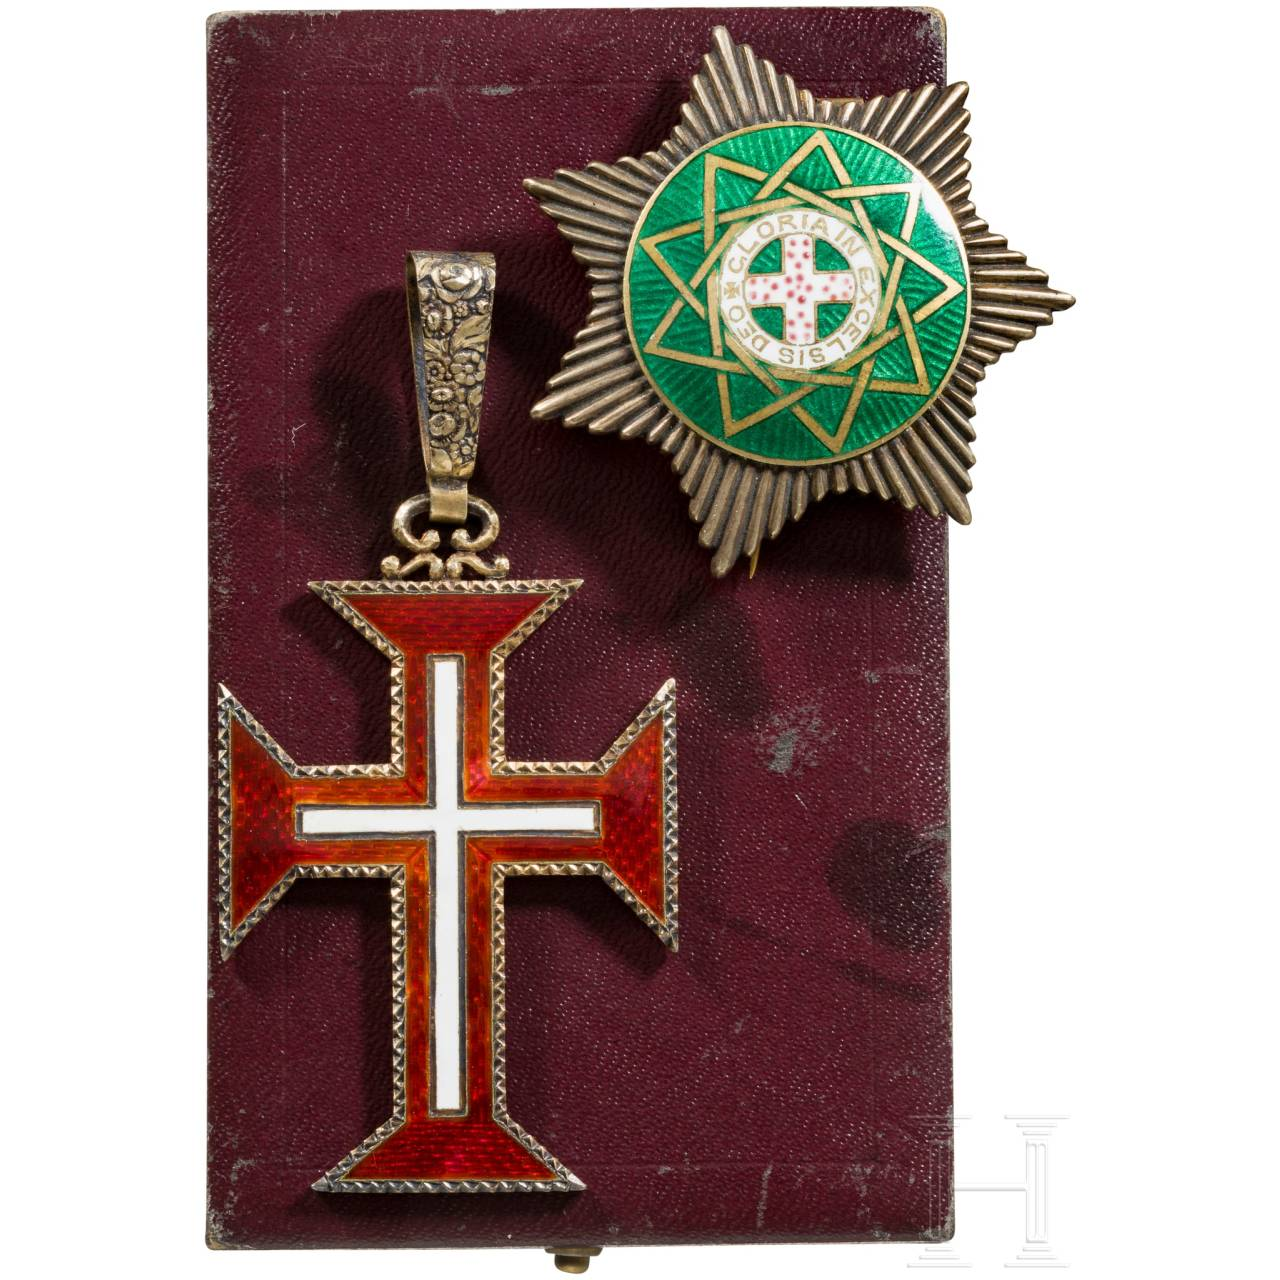 Two awards, Portugal and Freemason, 20th century